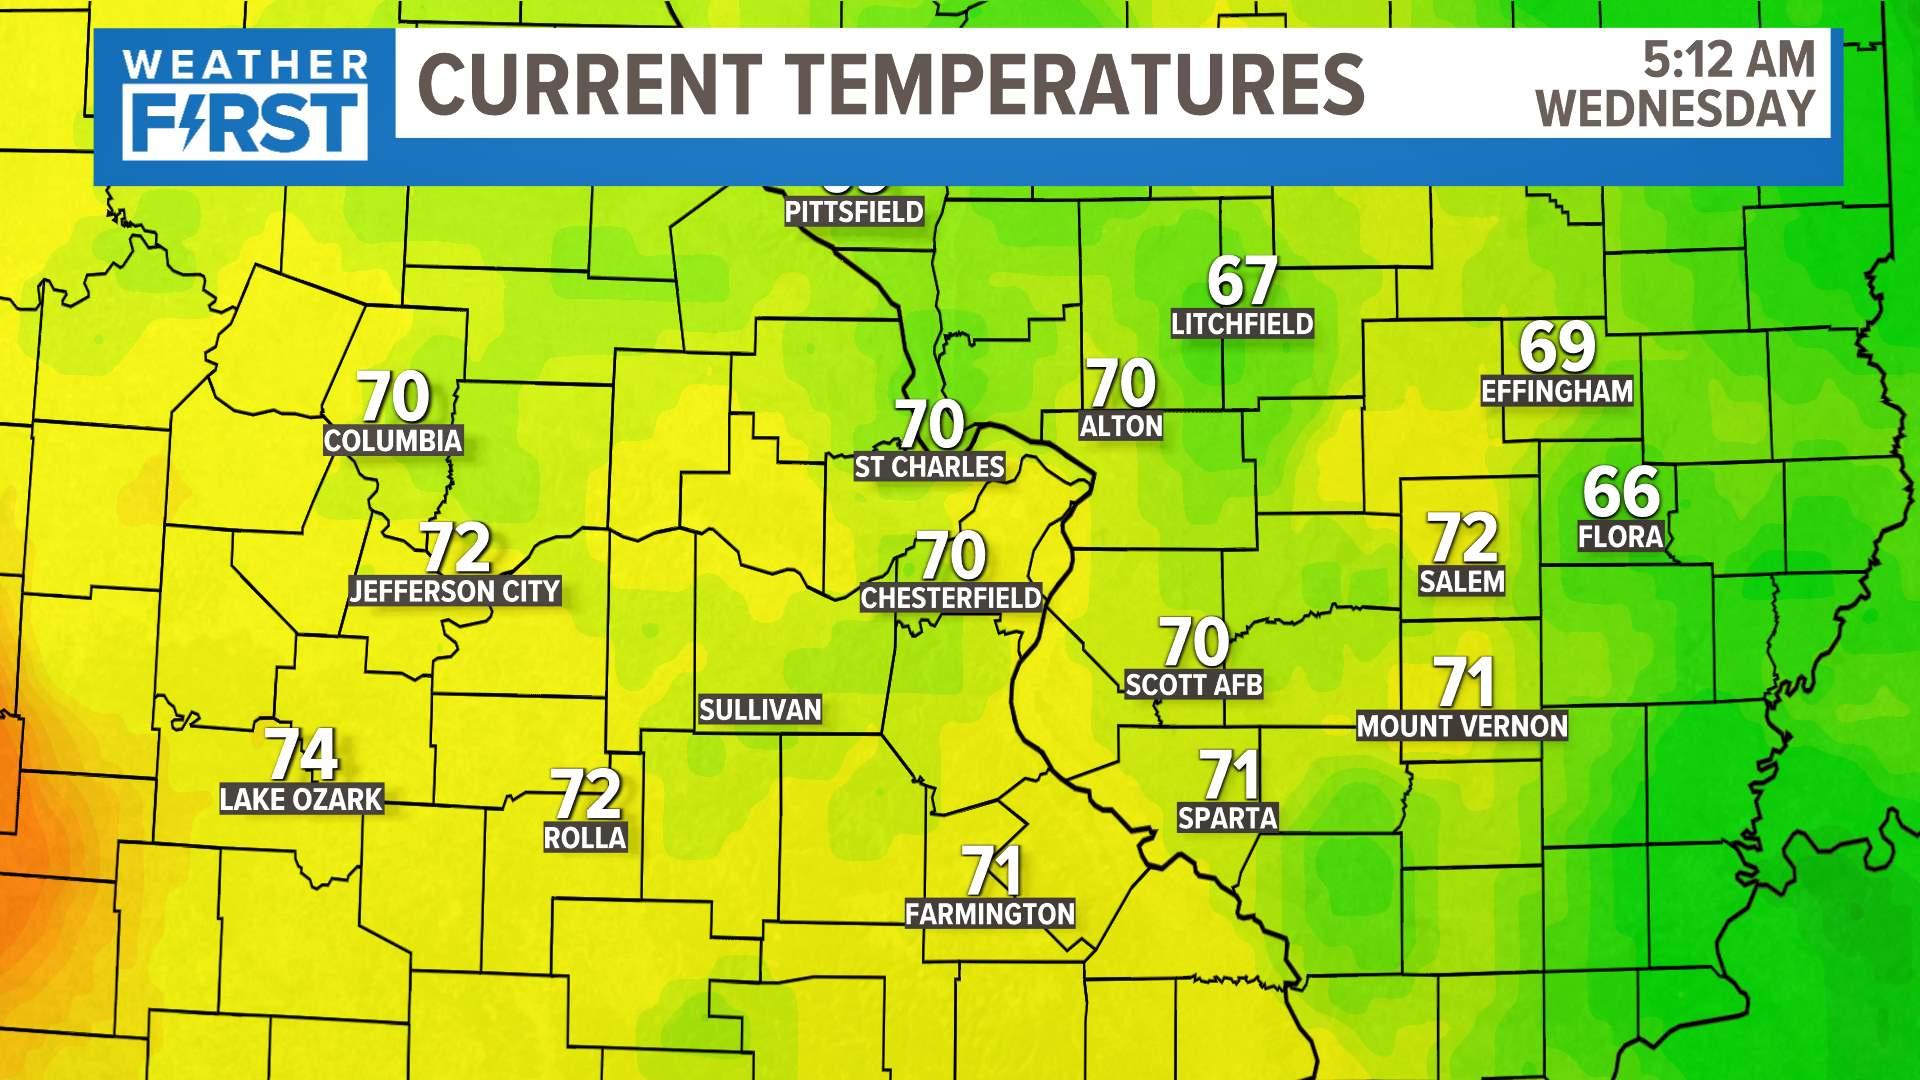 Current Feels Like Temperatures